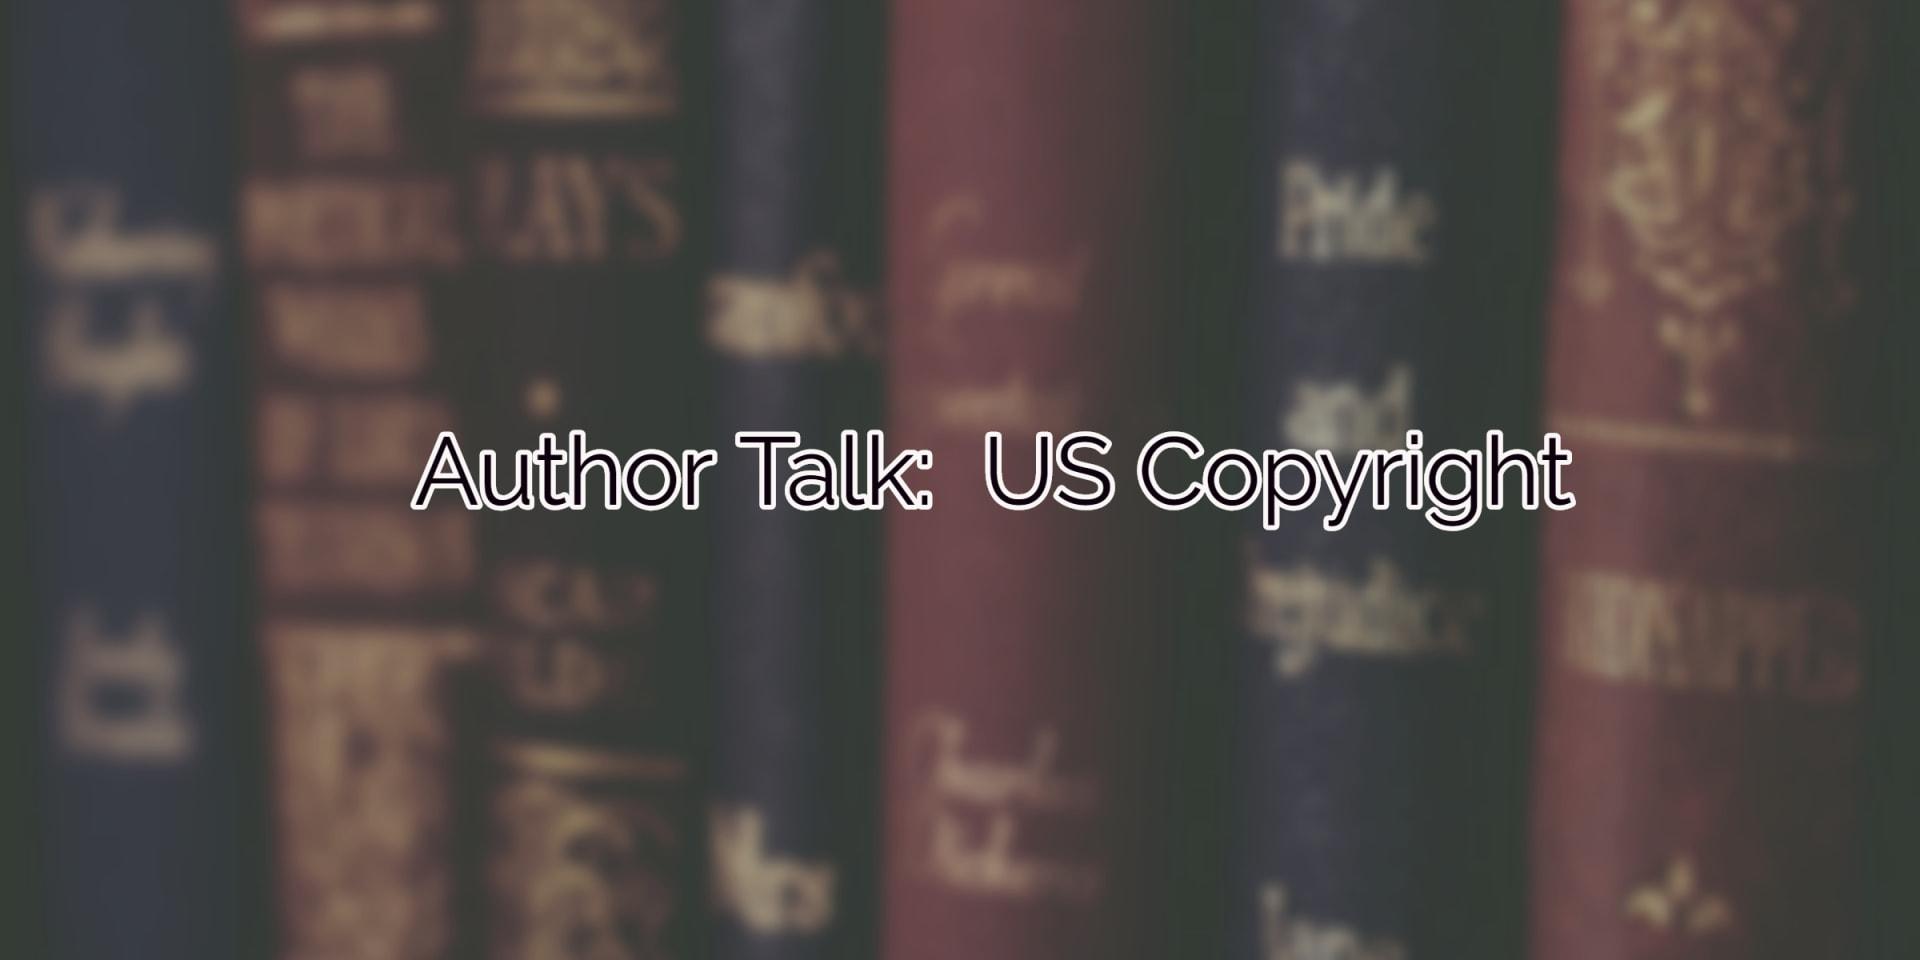 Author Talk:  US Copyright